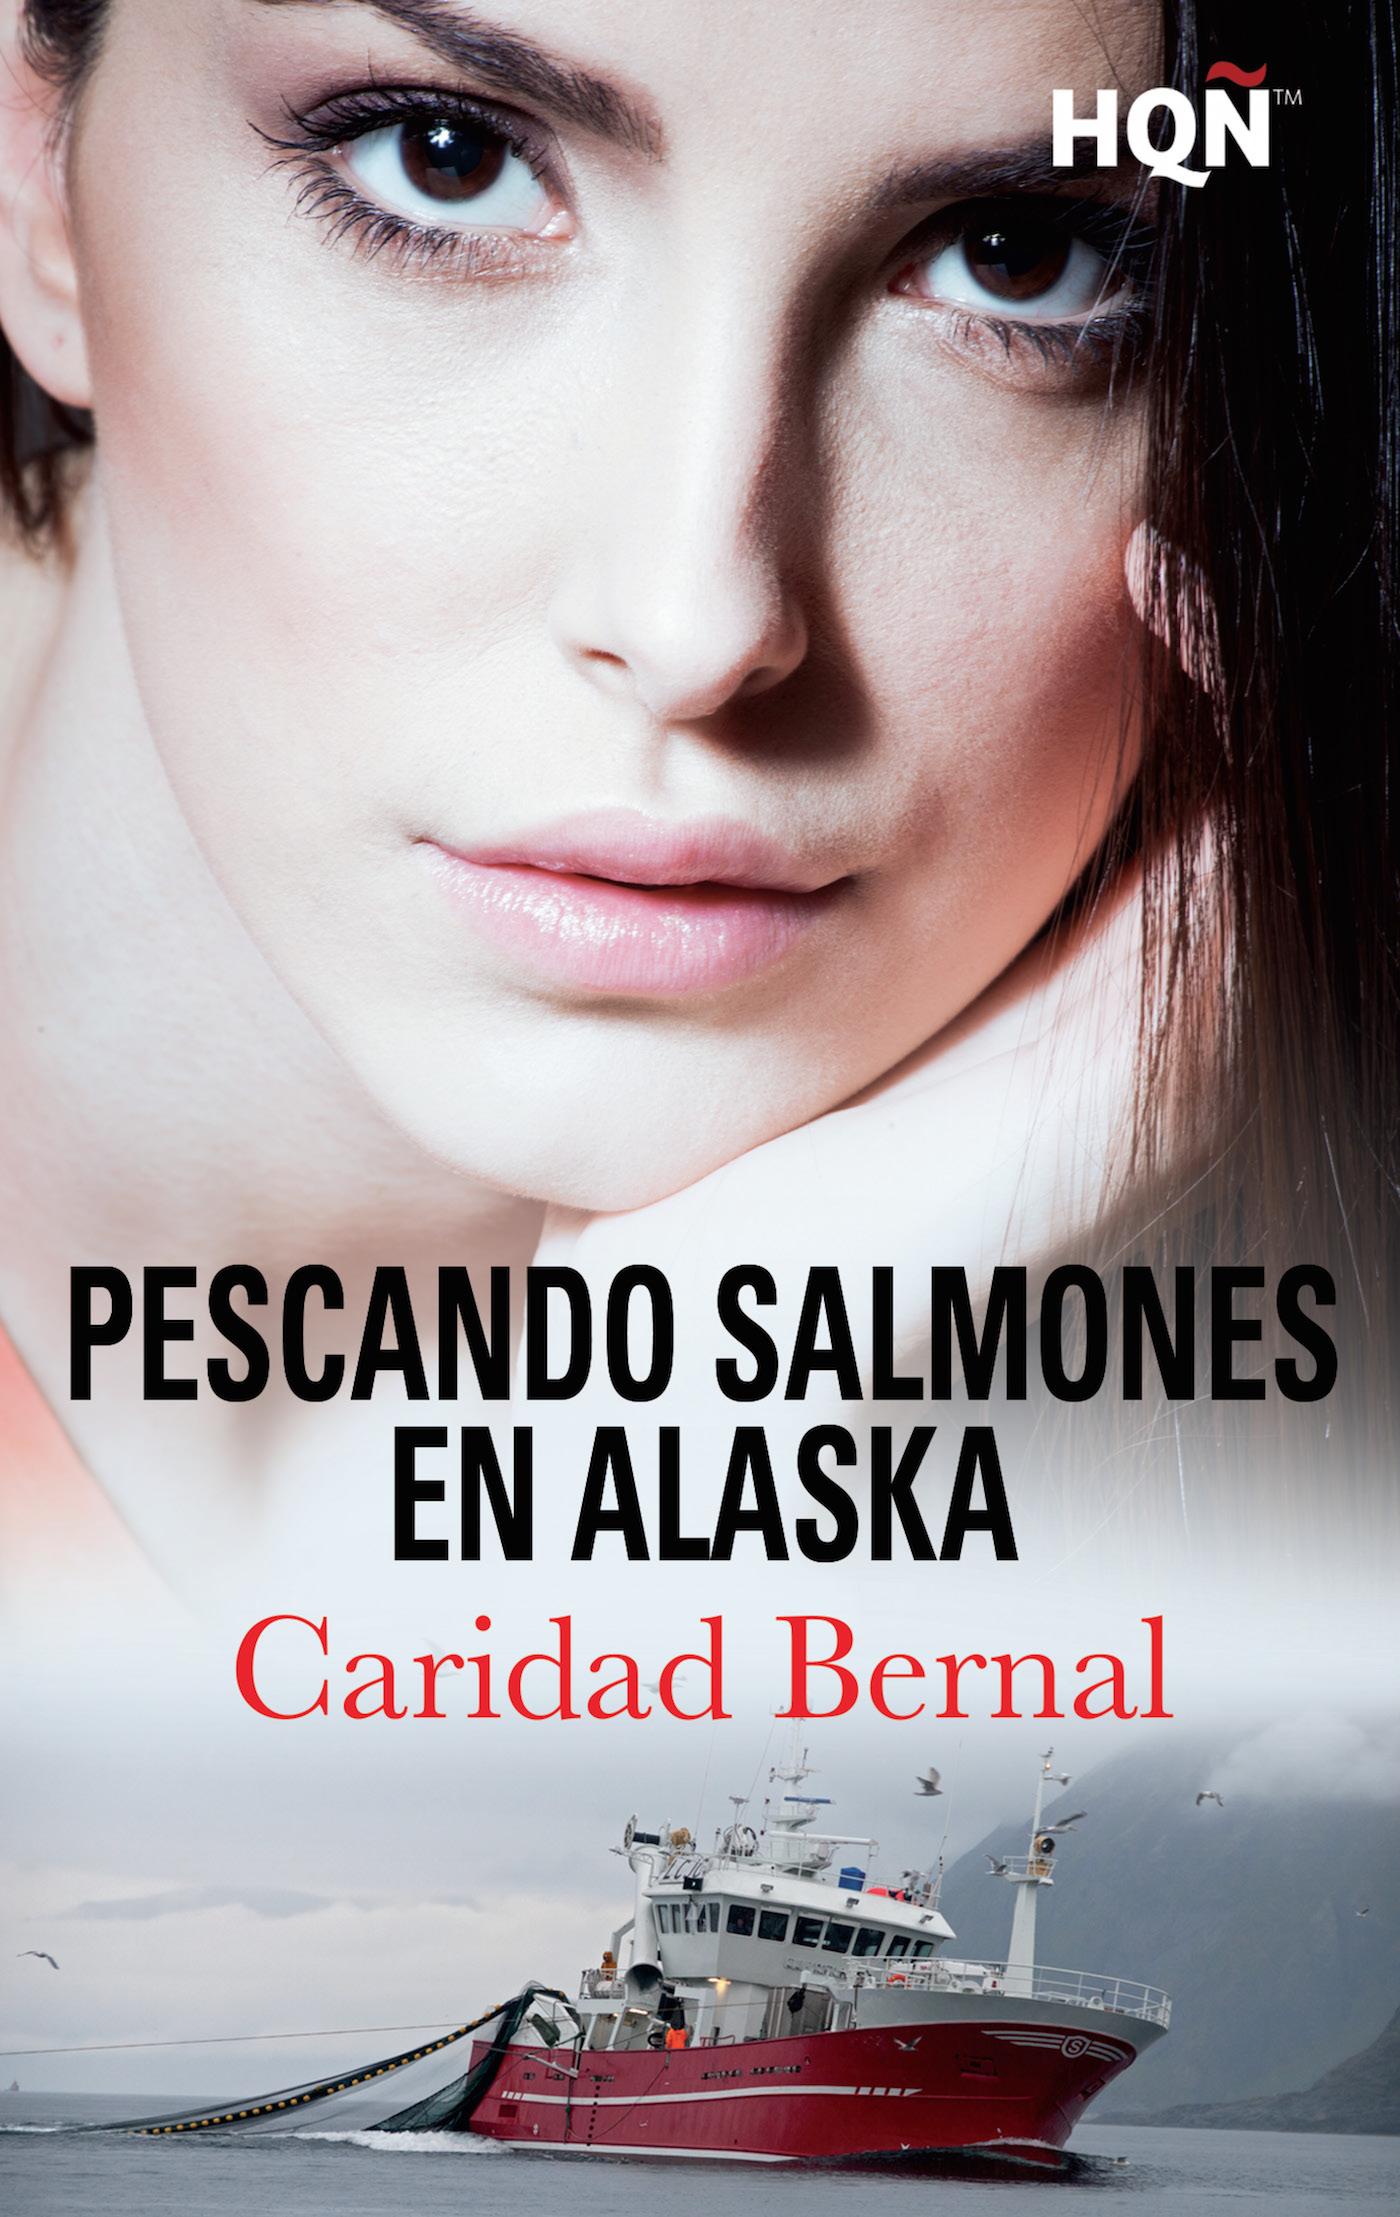 Pescando salmones en Alaska - Caridad Bernal